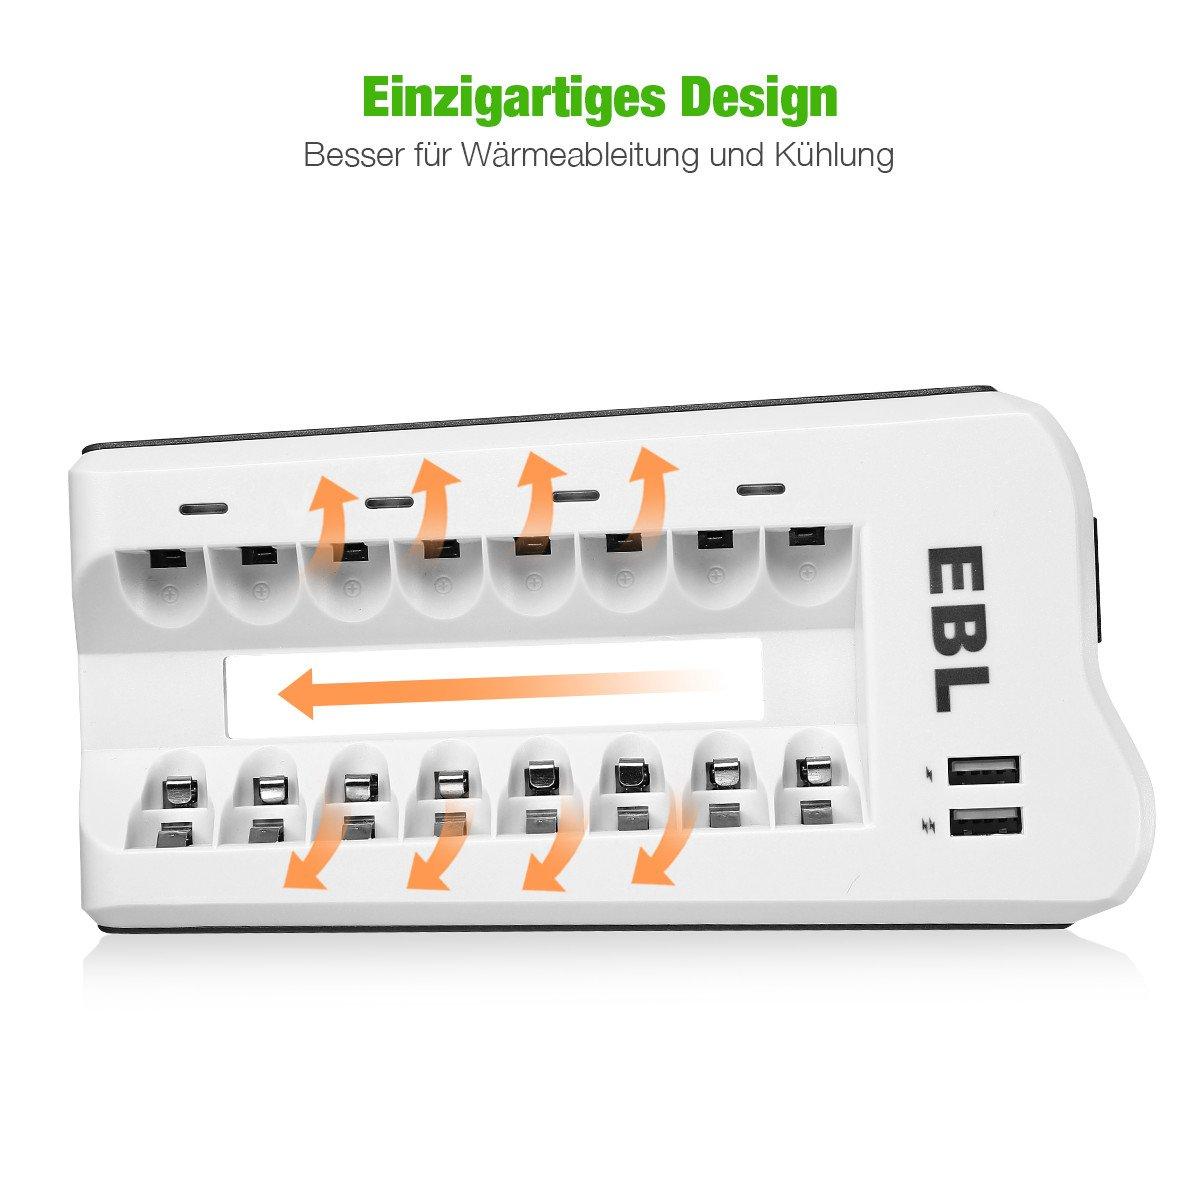 EBL Akkuladegerät 8 Stecker mit 2 USB Port für AA AAA NI-MH Akku inkl. 4*AA und 4*AAA Akku